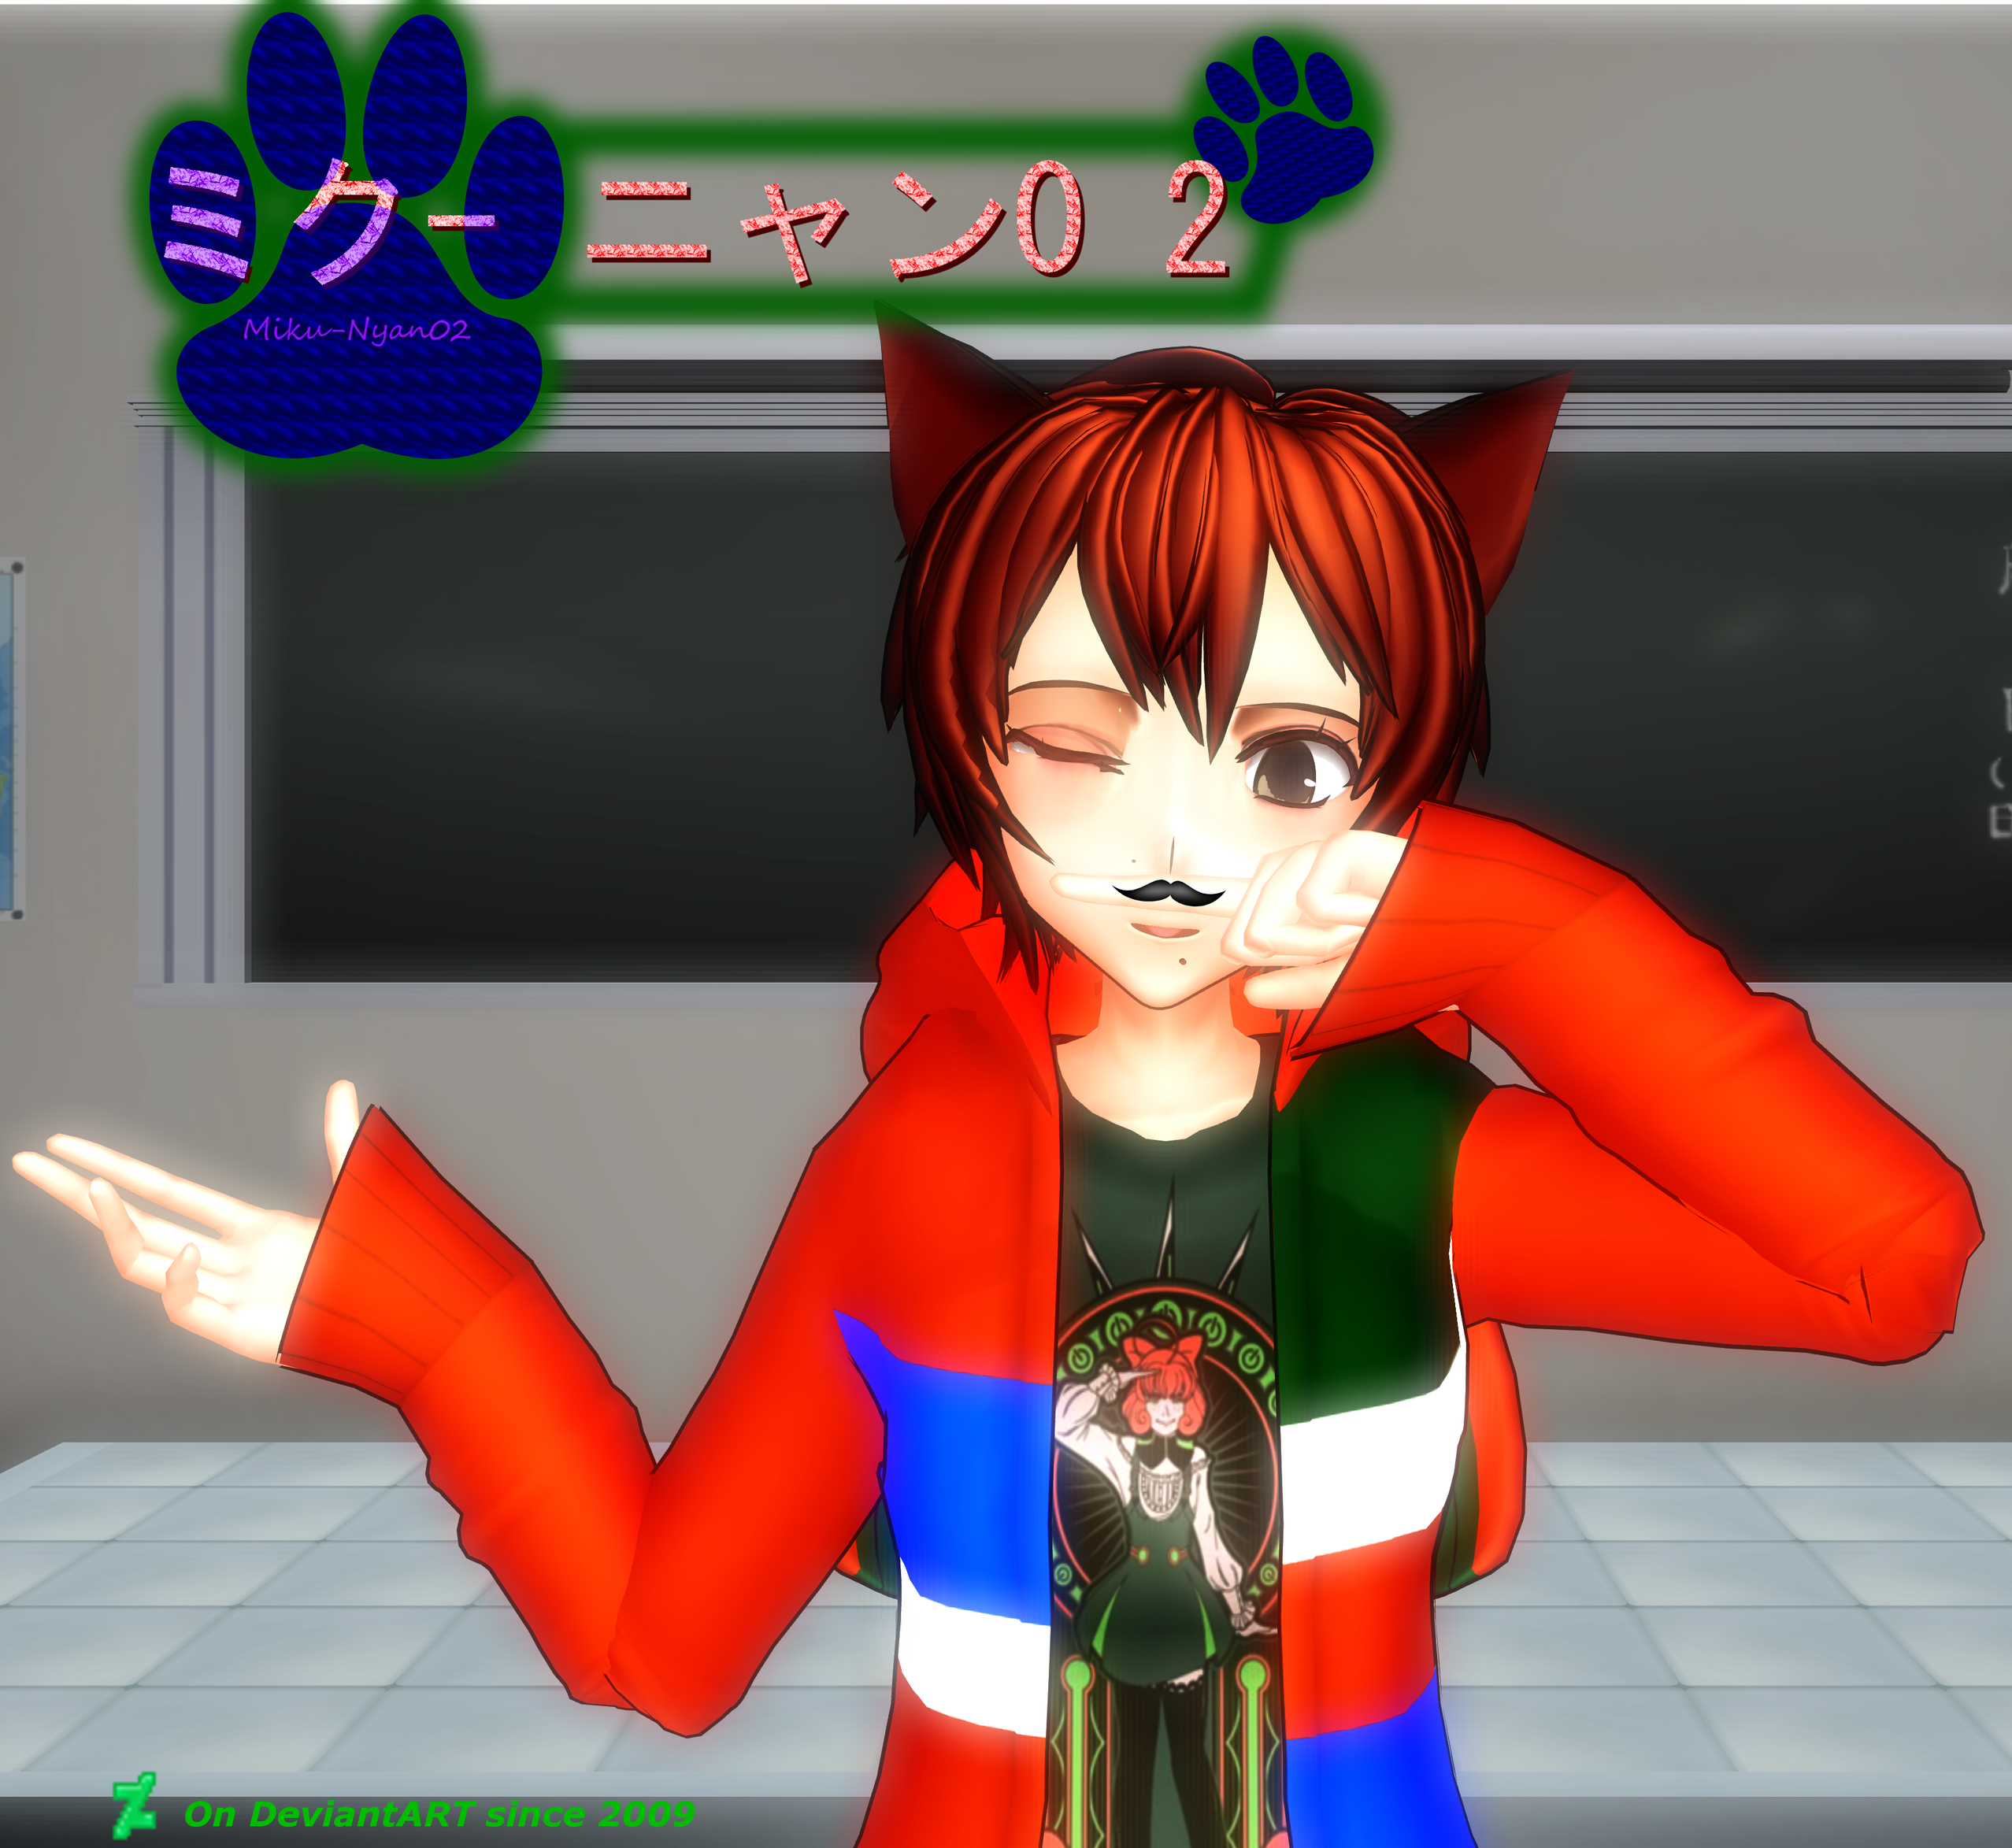 Miku-Nyan02's Profile Picture